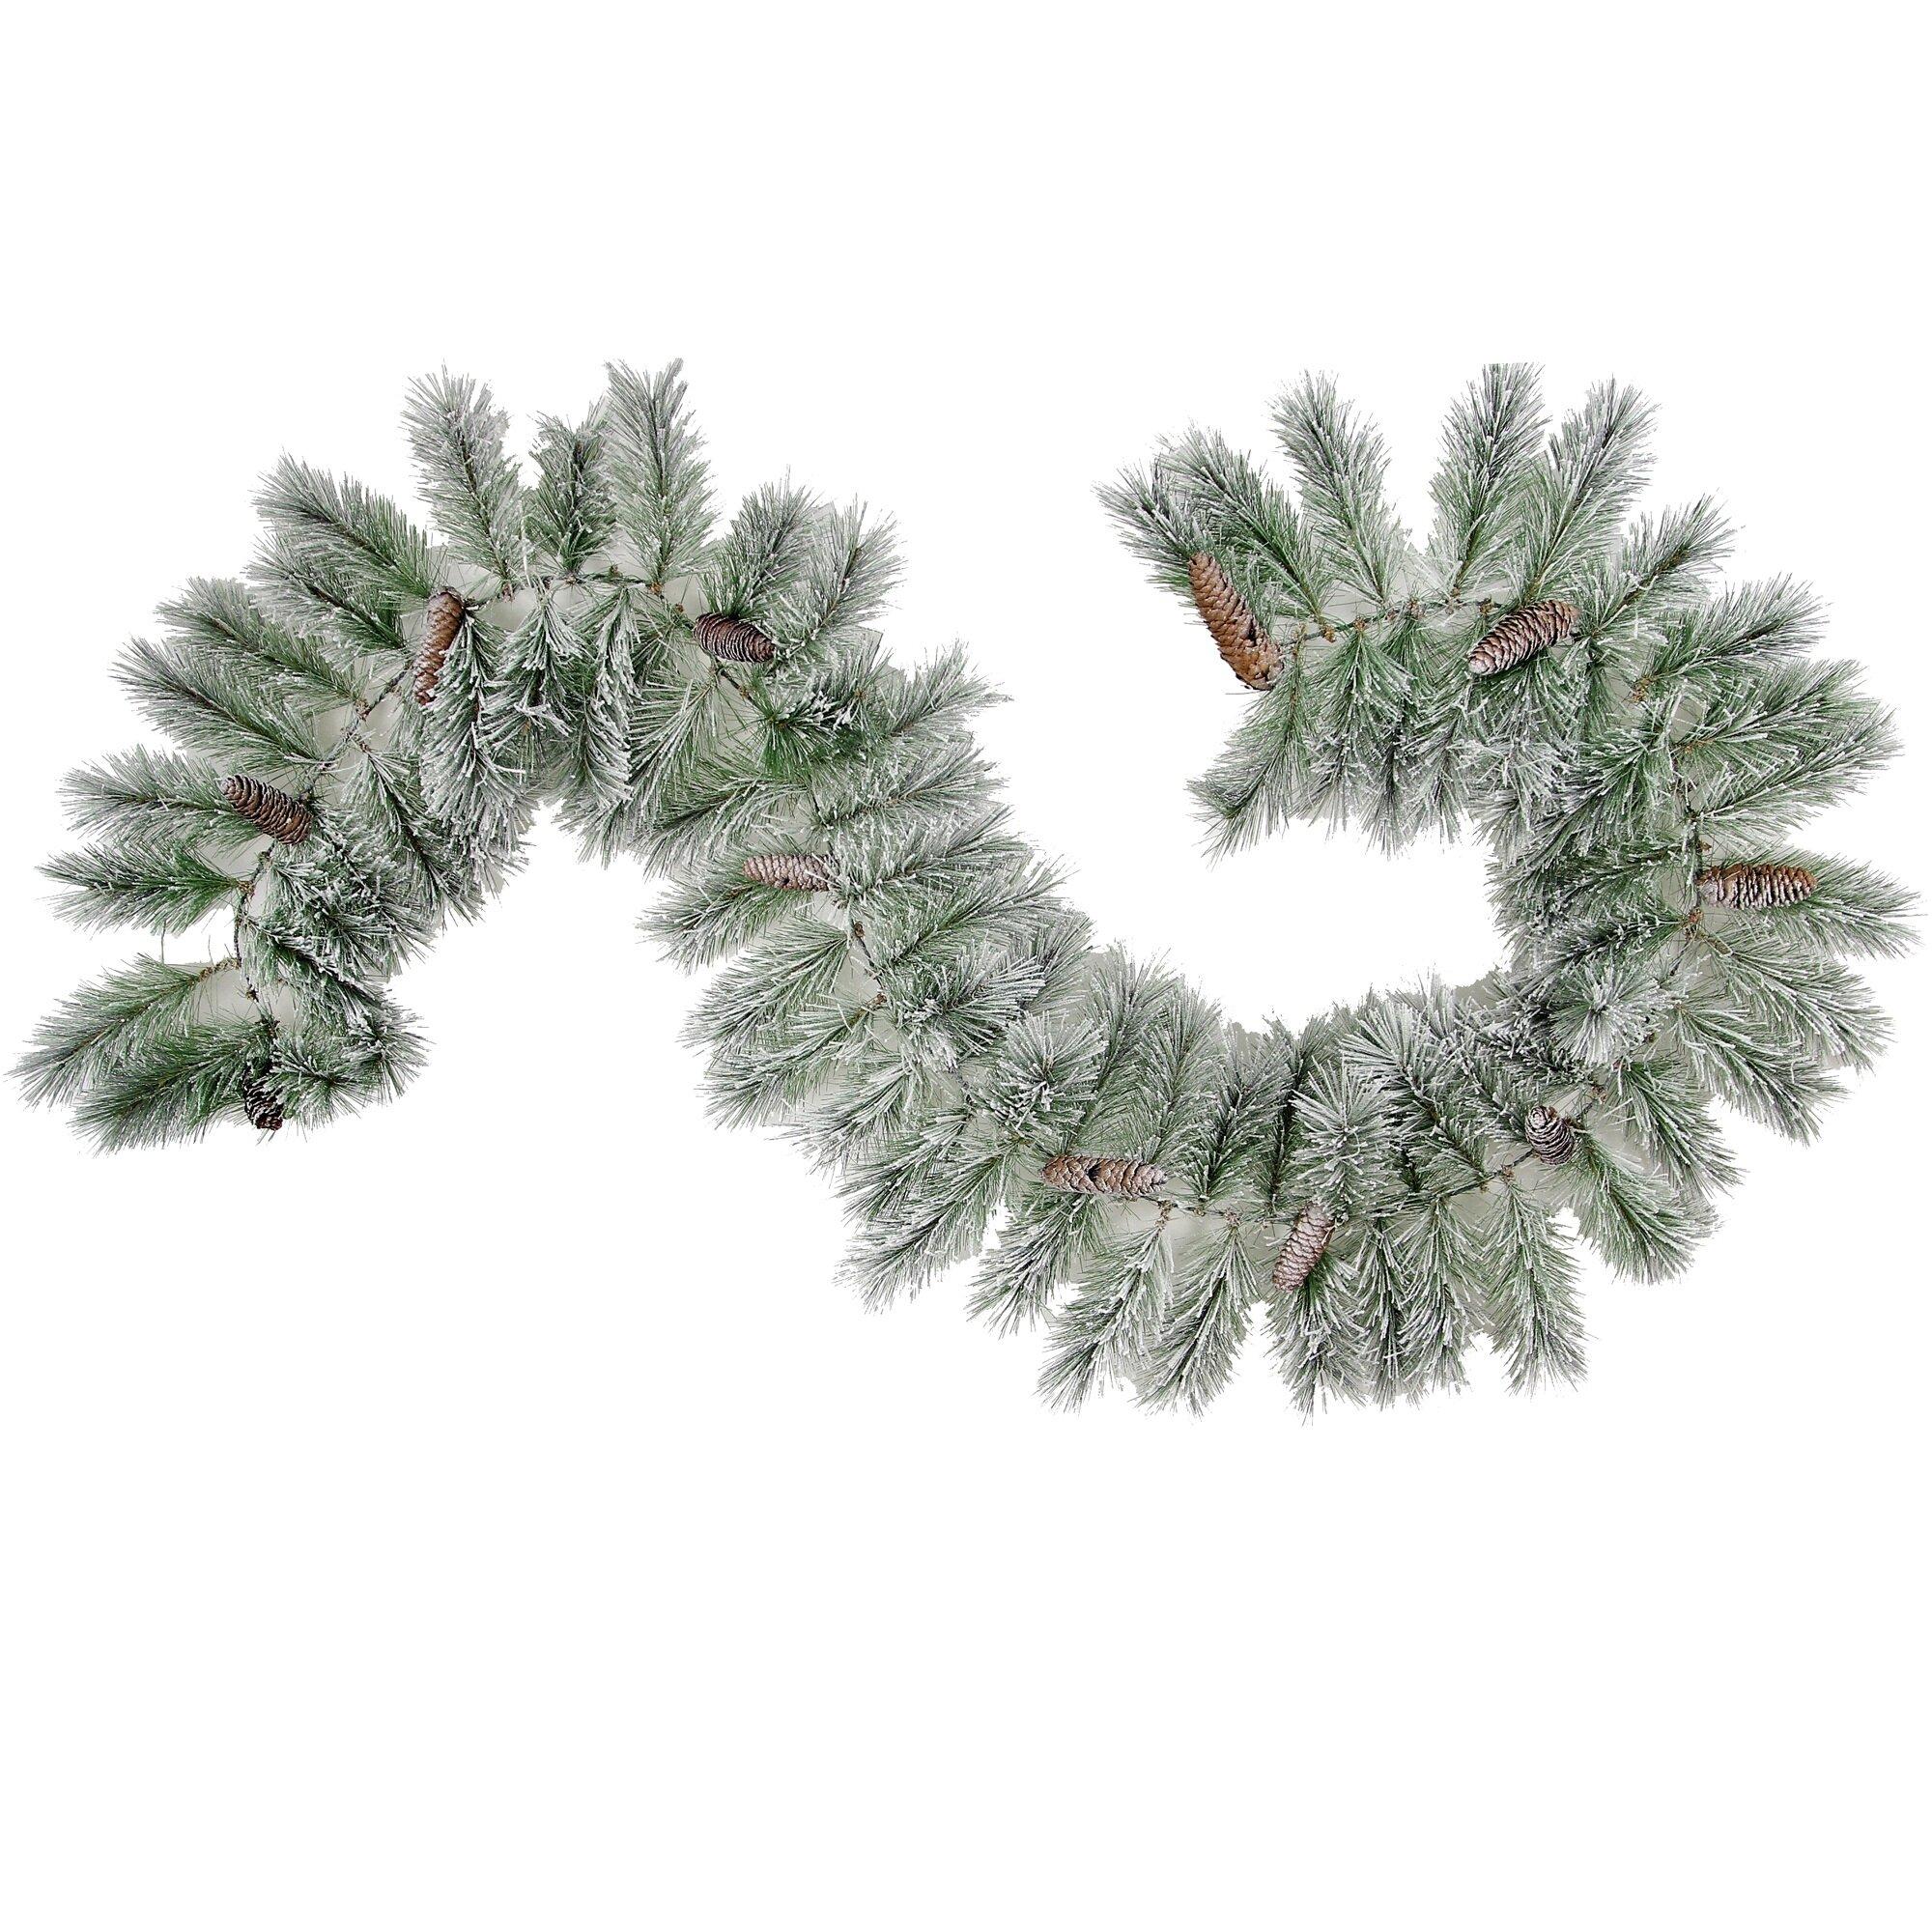 Christmas Pine Garland.108 Christmas Pine Garland